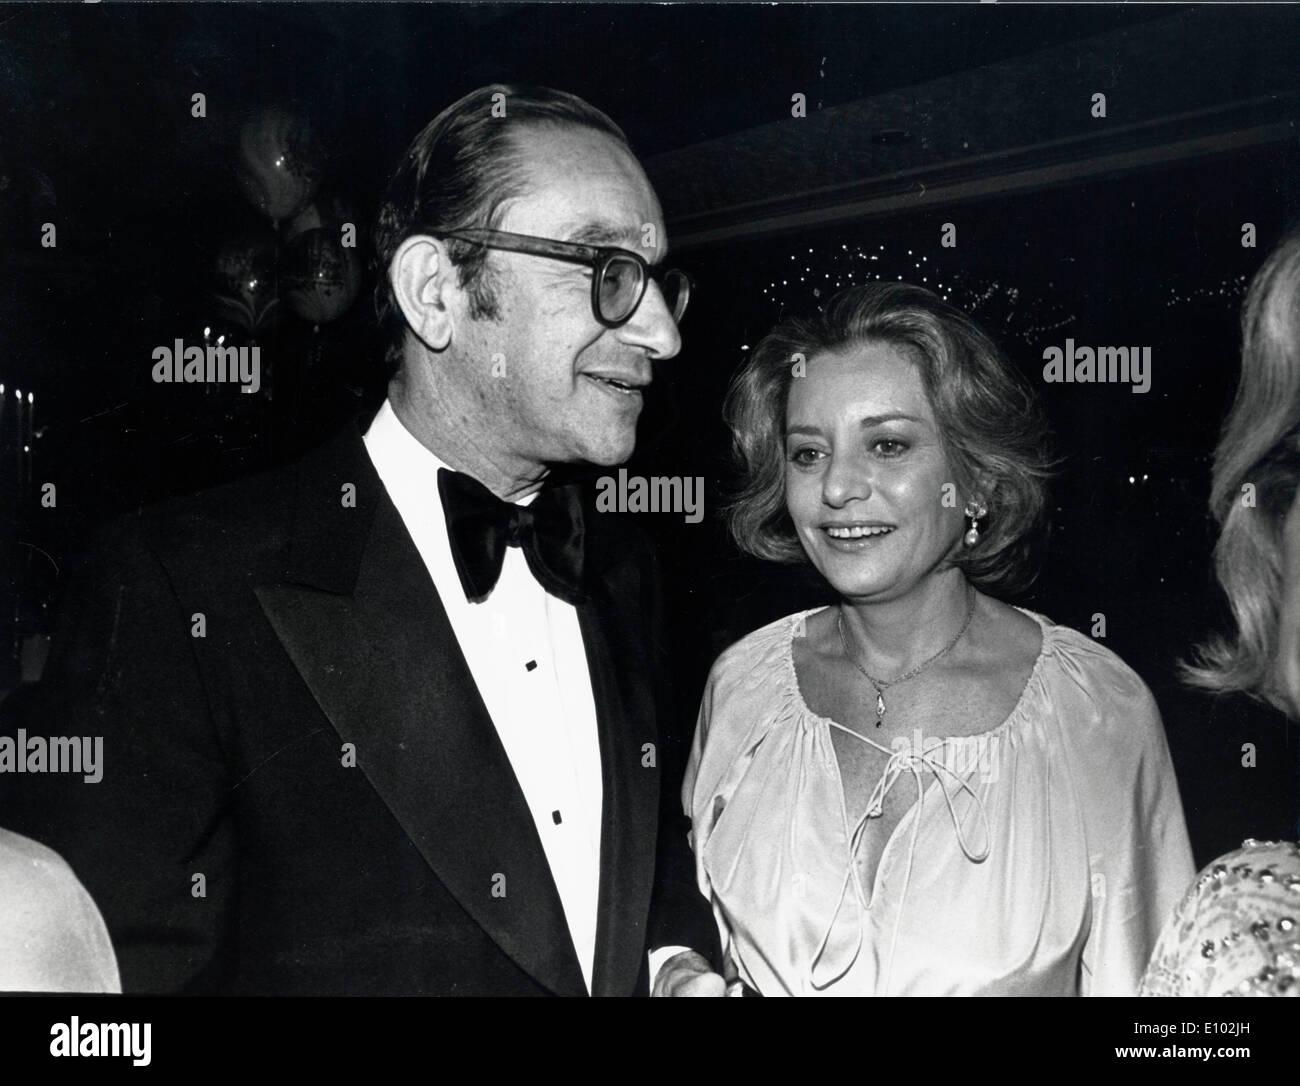 Journalist Barbara Walters with politician Alan Greenspan - Stock Image